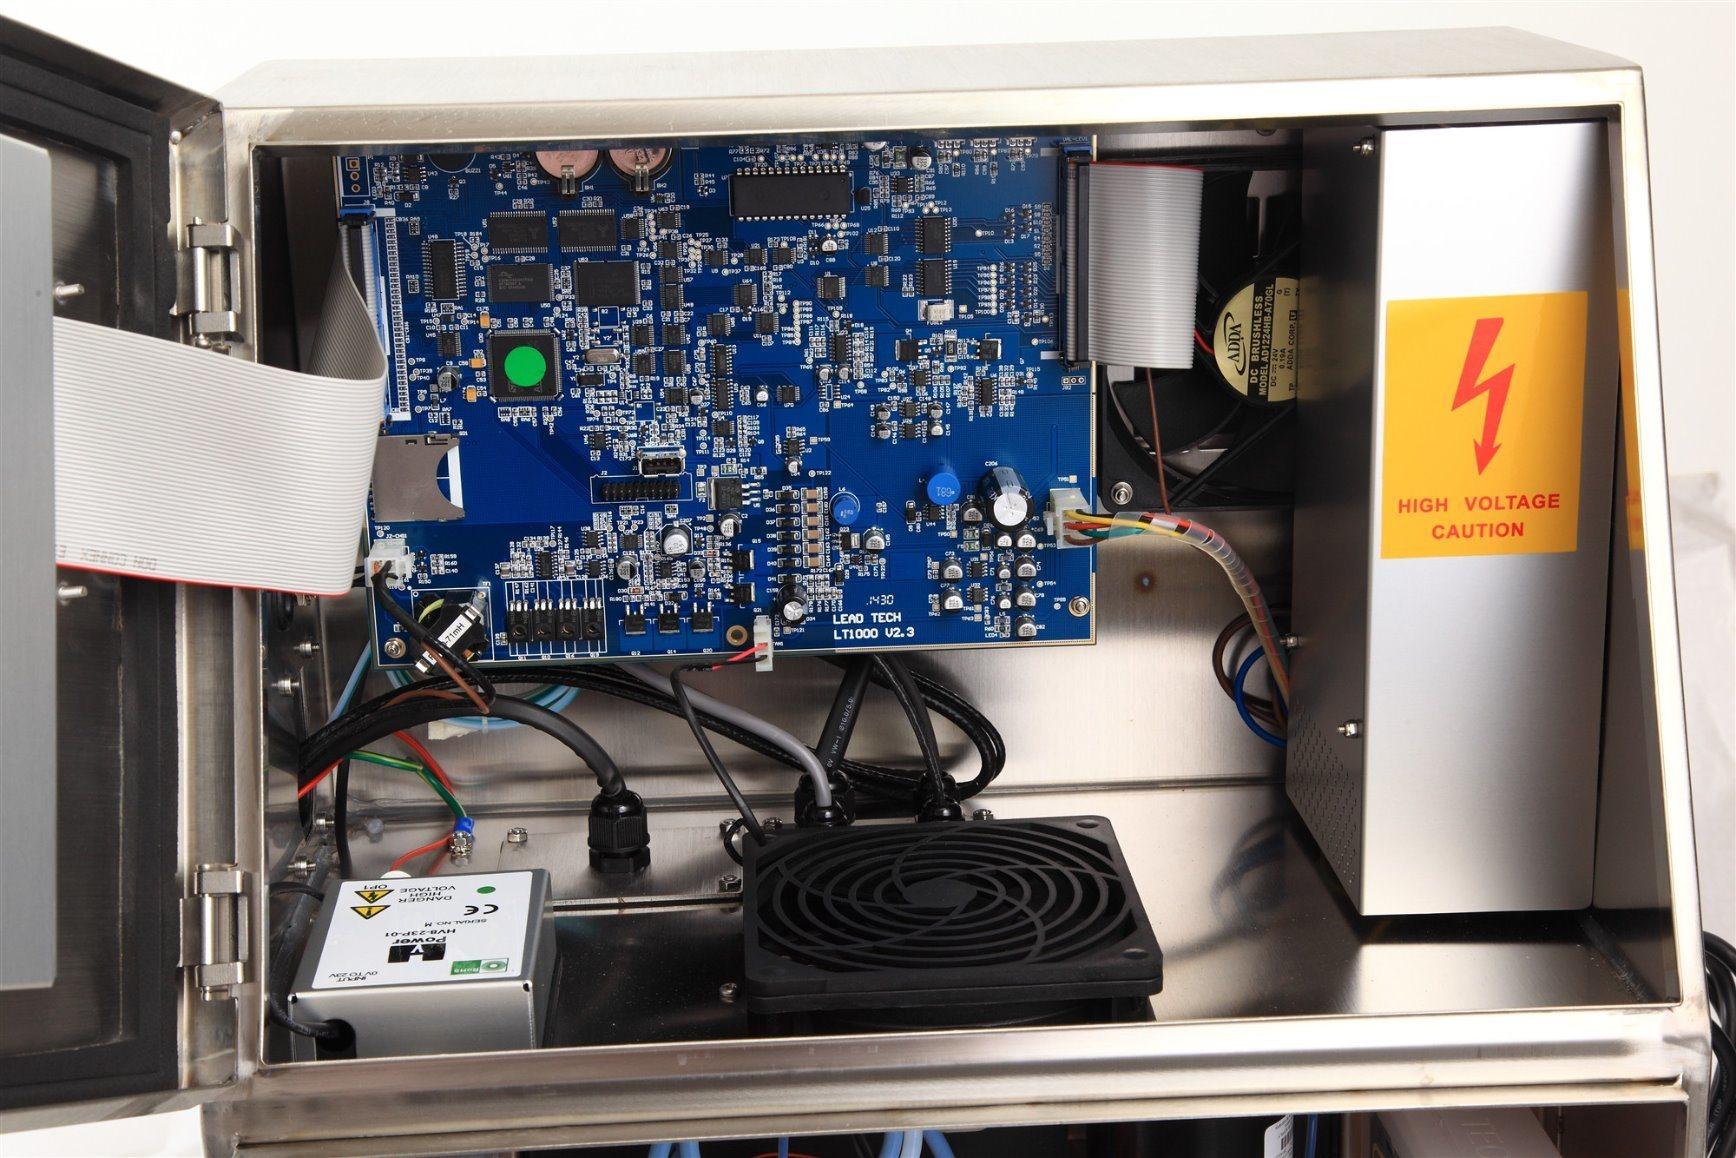 Lead Tech Lt1000s+ Black to Red Coding Cij Inkjet Printer